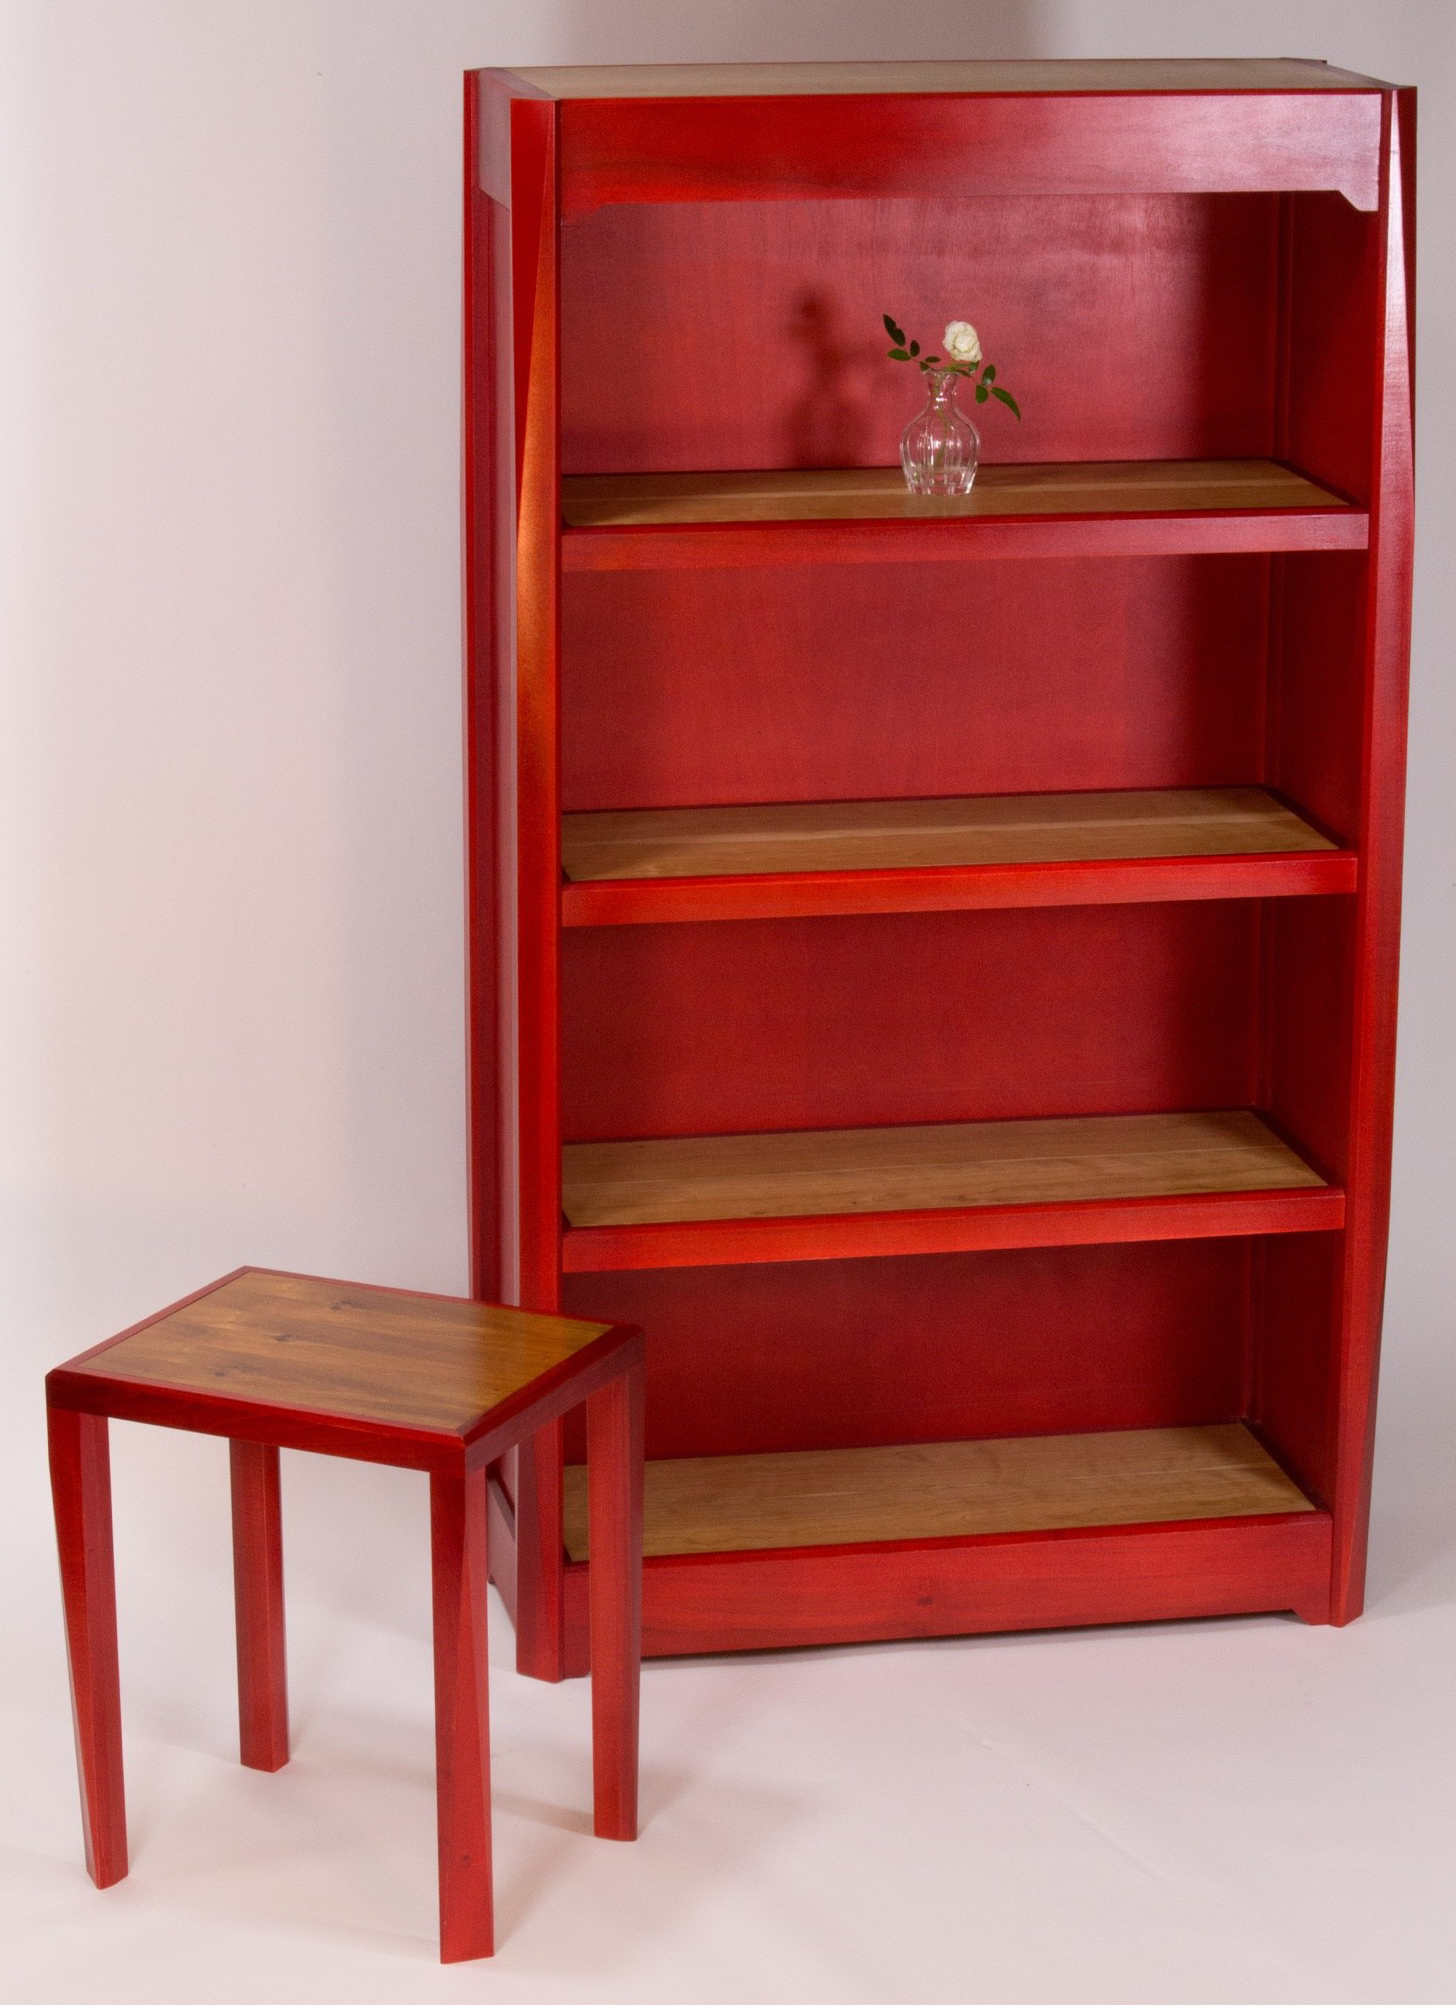 mardi-gras-furniture-11.jpg